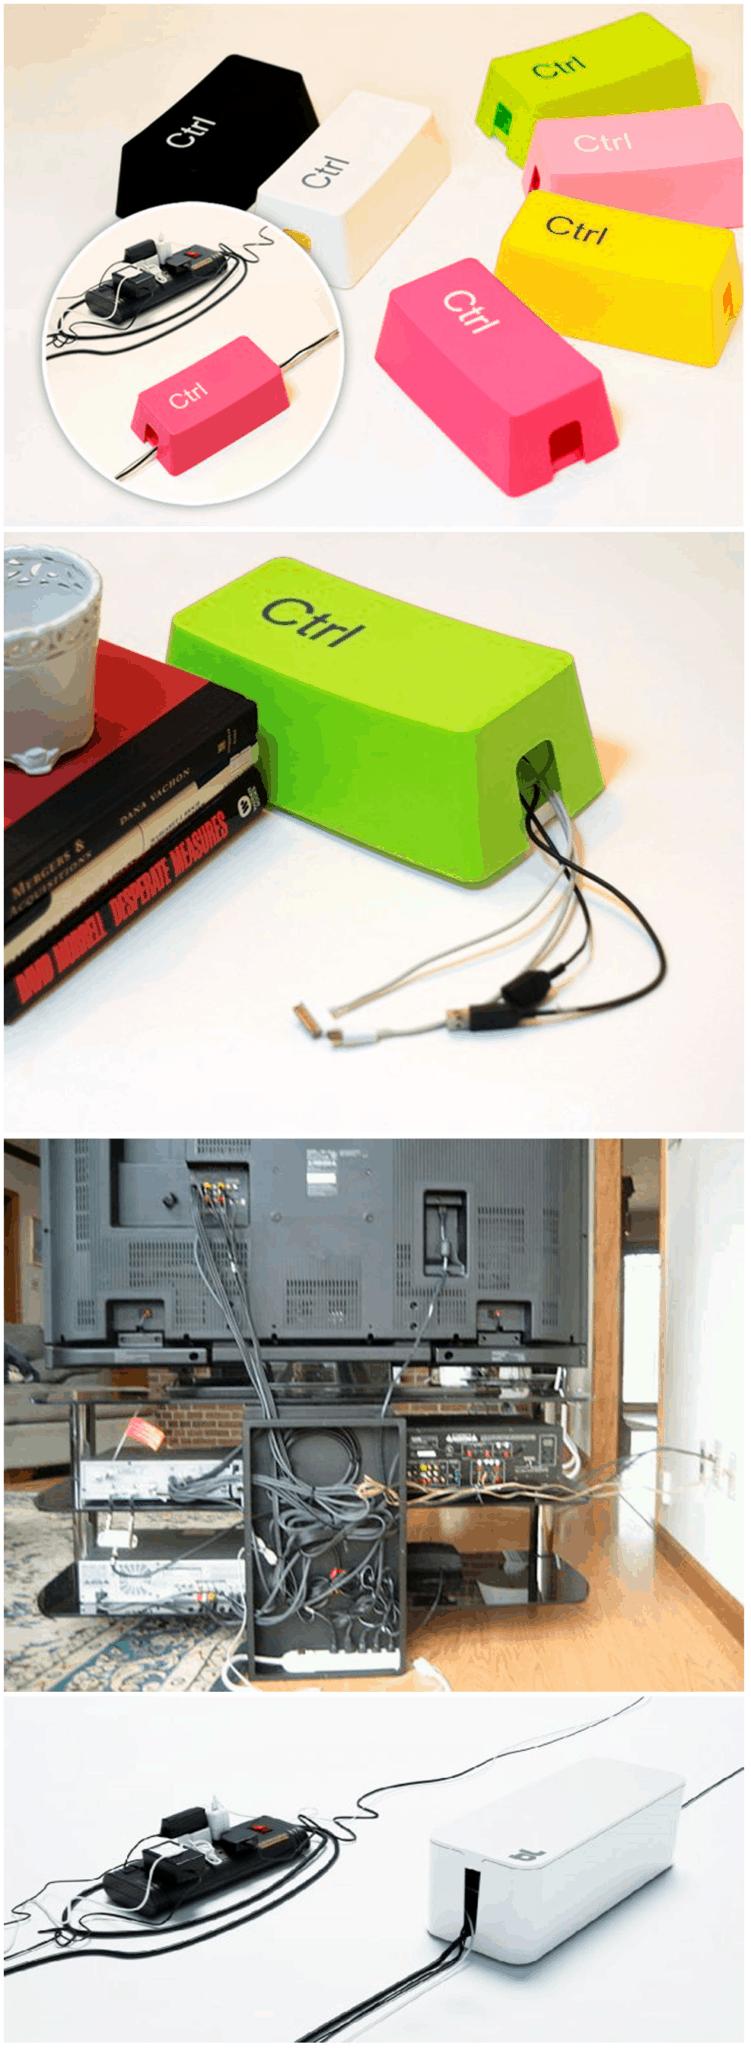 esconder-cabo-fio-cablebox